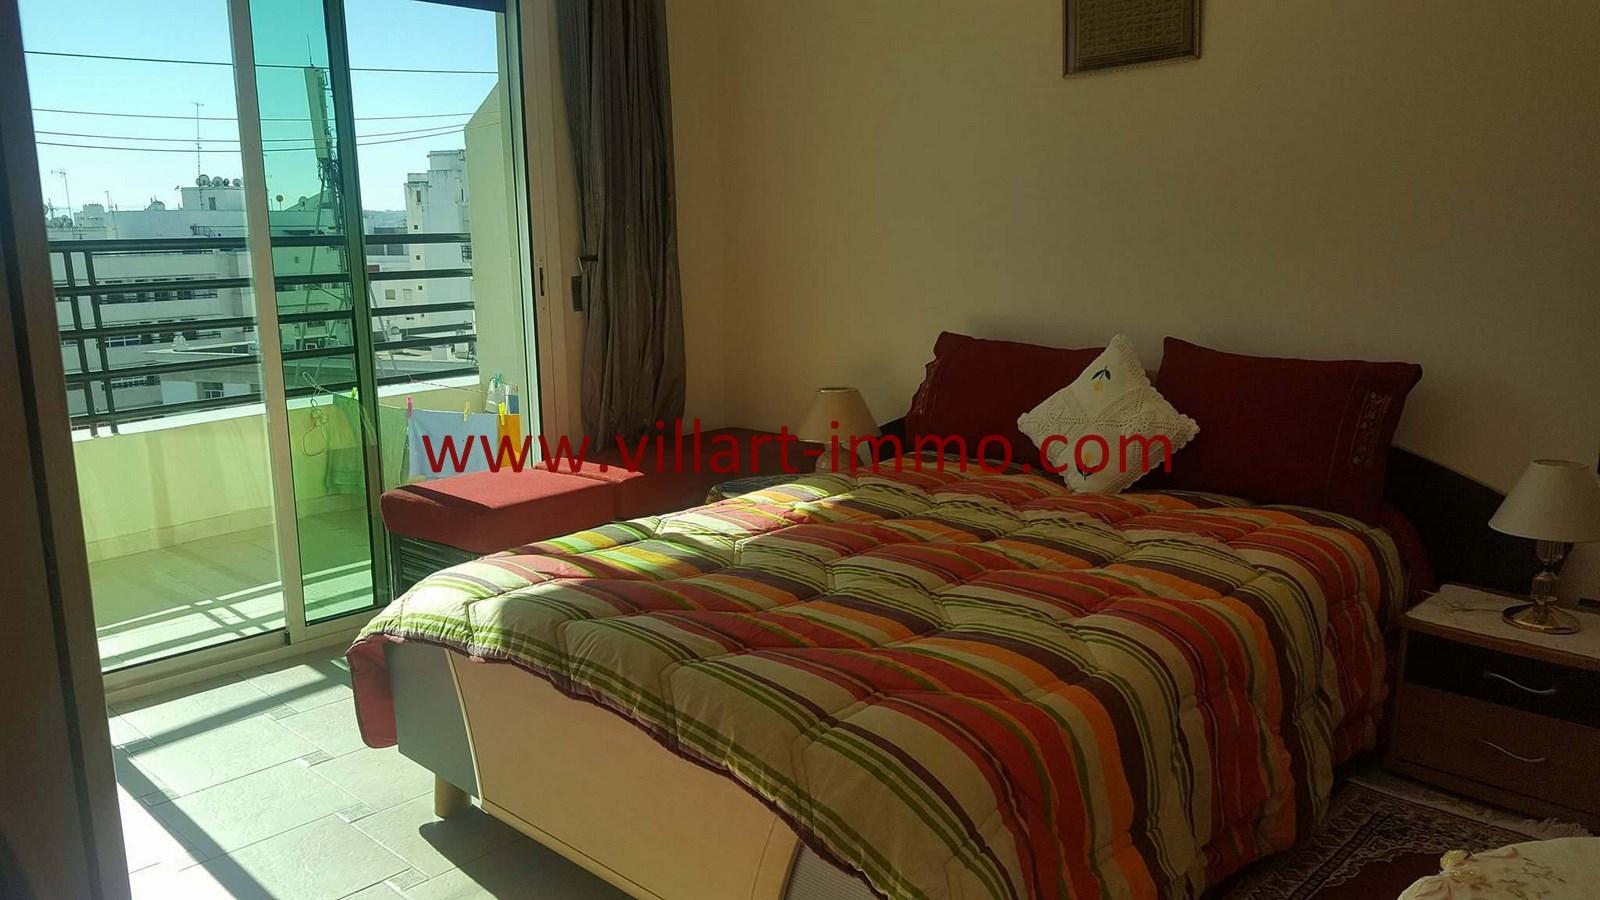 5-Vente-Appartement-Centre-ville-Tanger-Chambre 2-VA531-Villart Immo